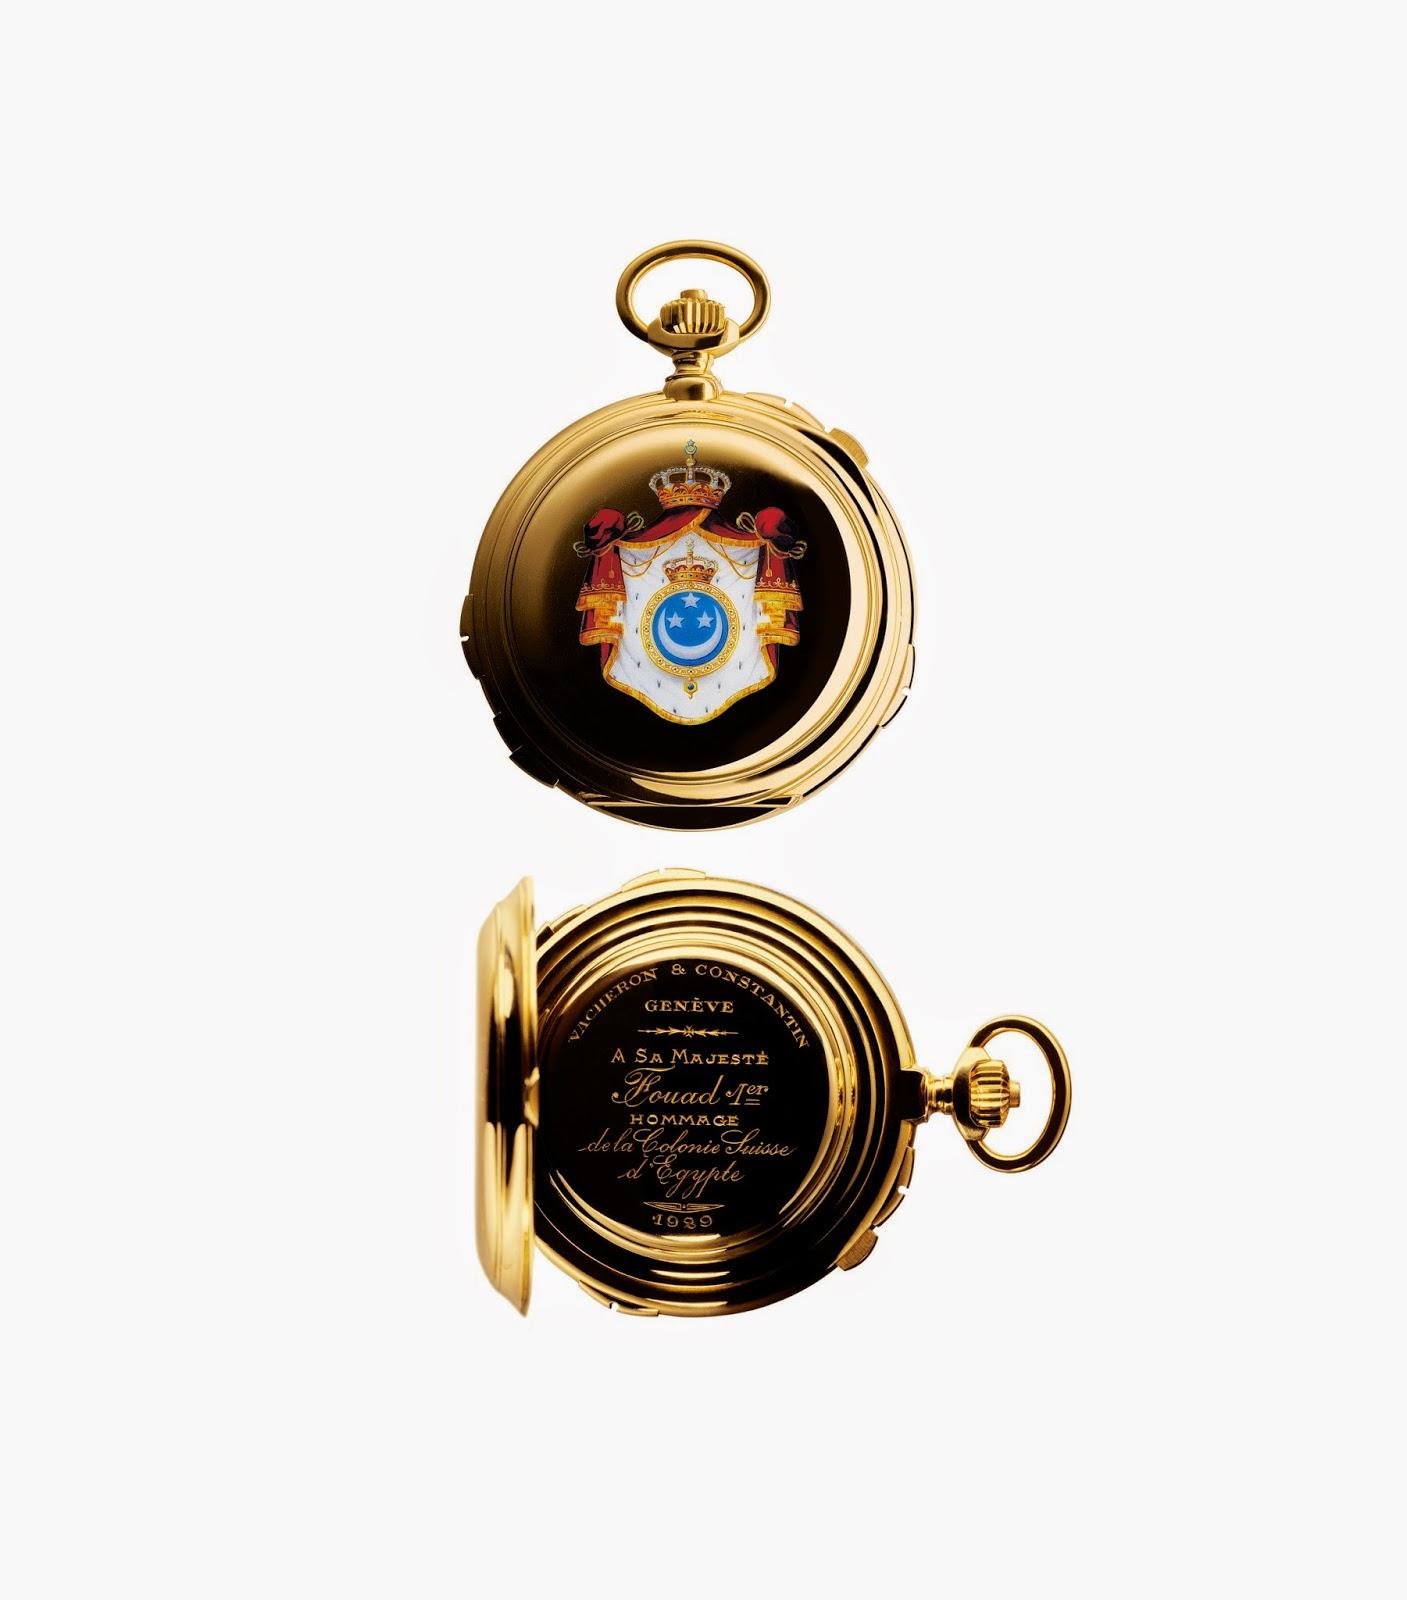 Vacheron Constantin Historia3